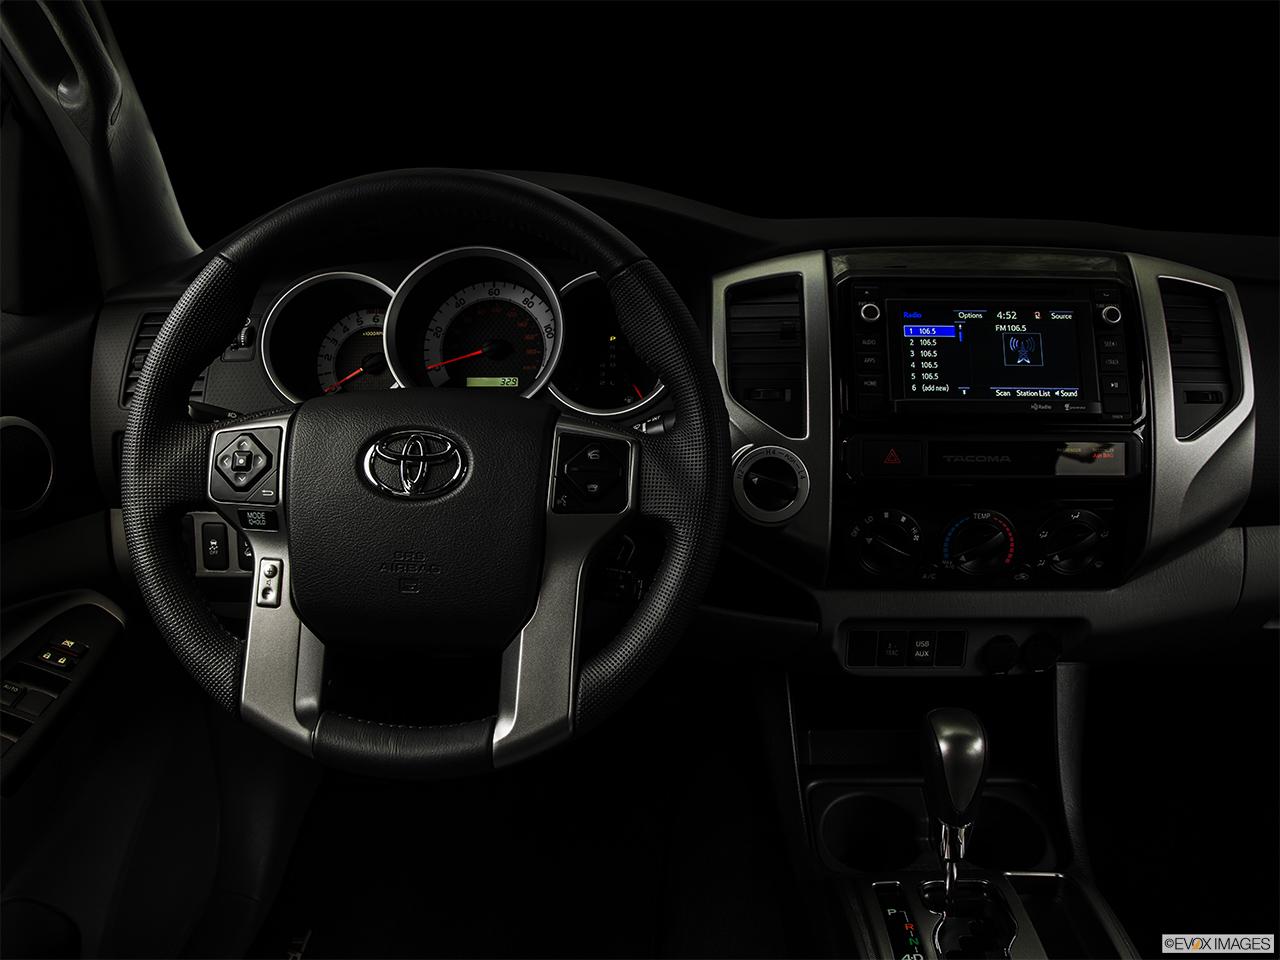 2015 Toyota Tacoma 4WD Double Cab V6 MT   Centered Wide Dash Shot   U0027night